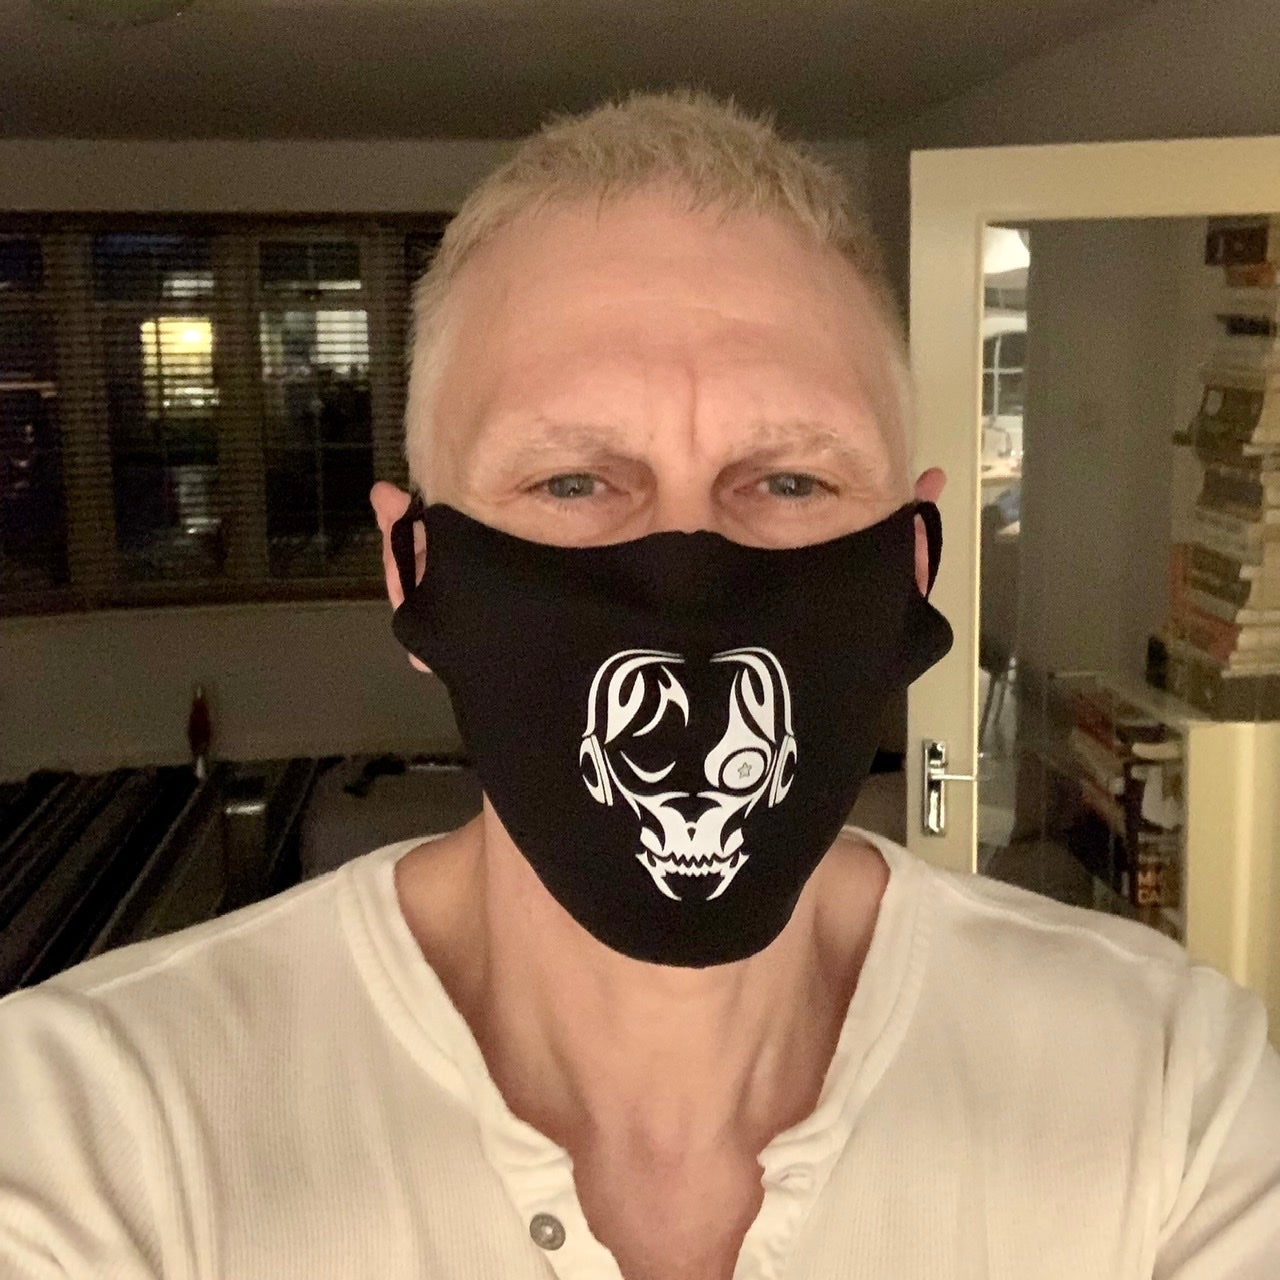 Image of Zed Hed Face Mask